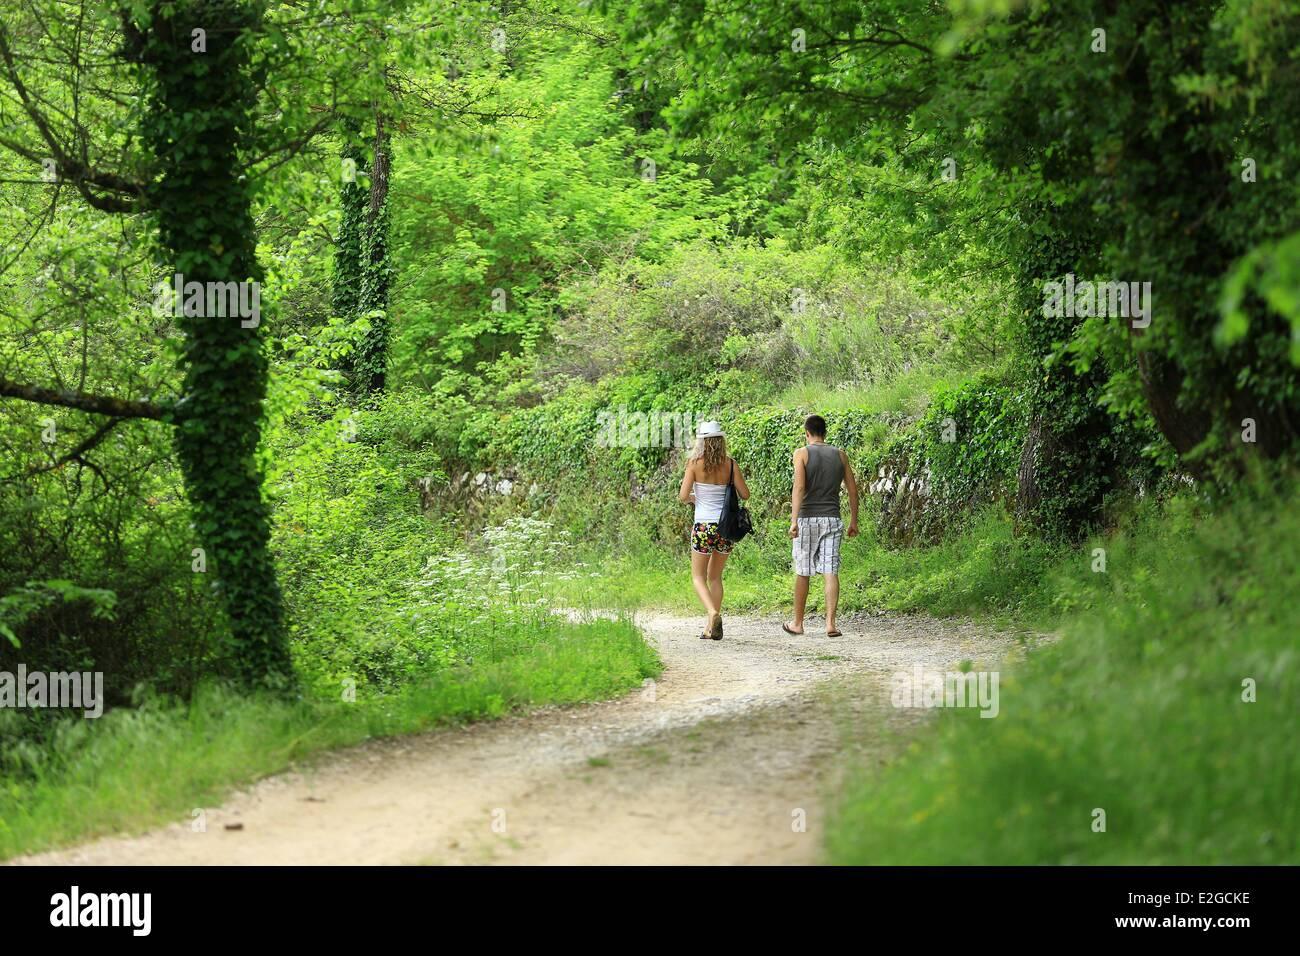 France Var Provence Verte Bras Triassic source - Stock Image